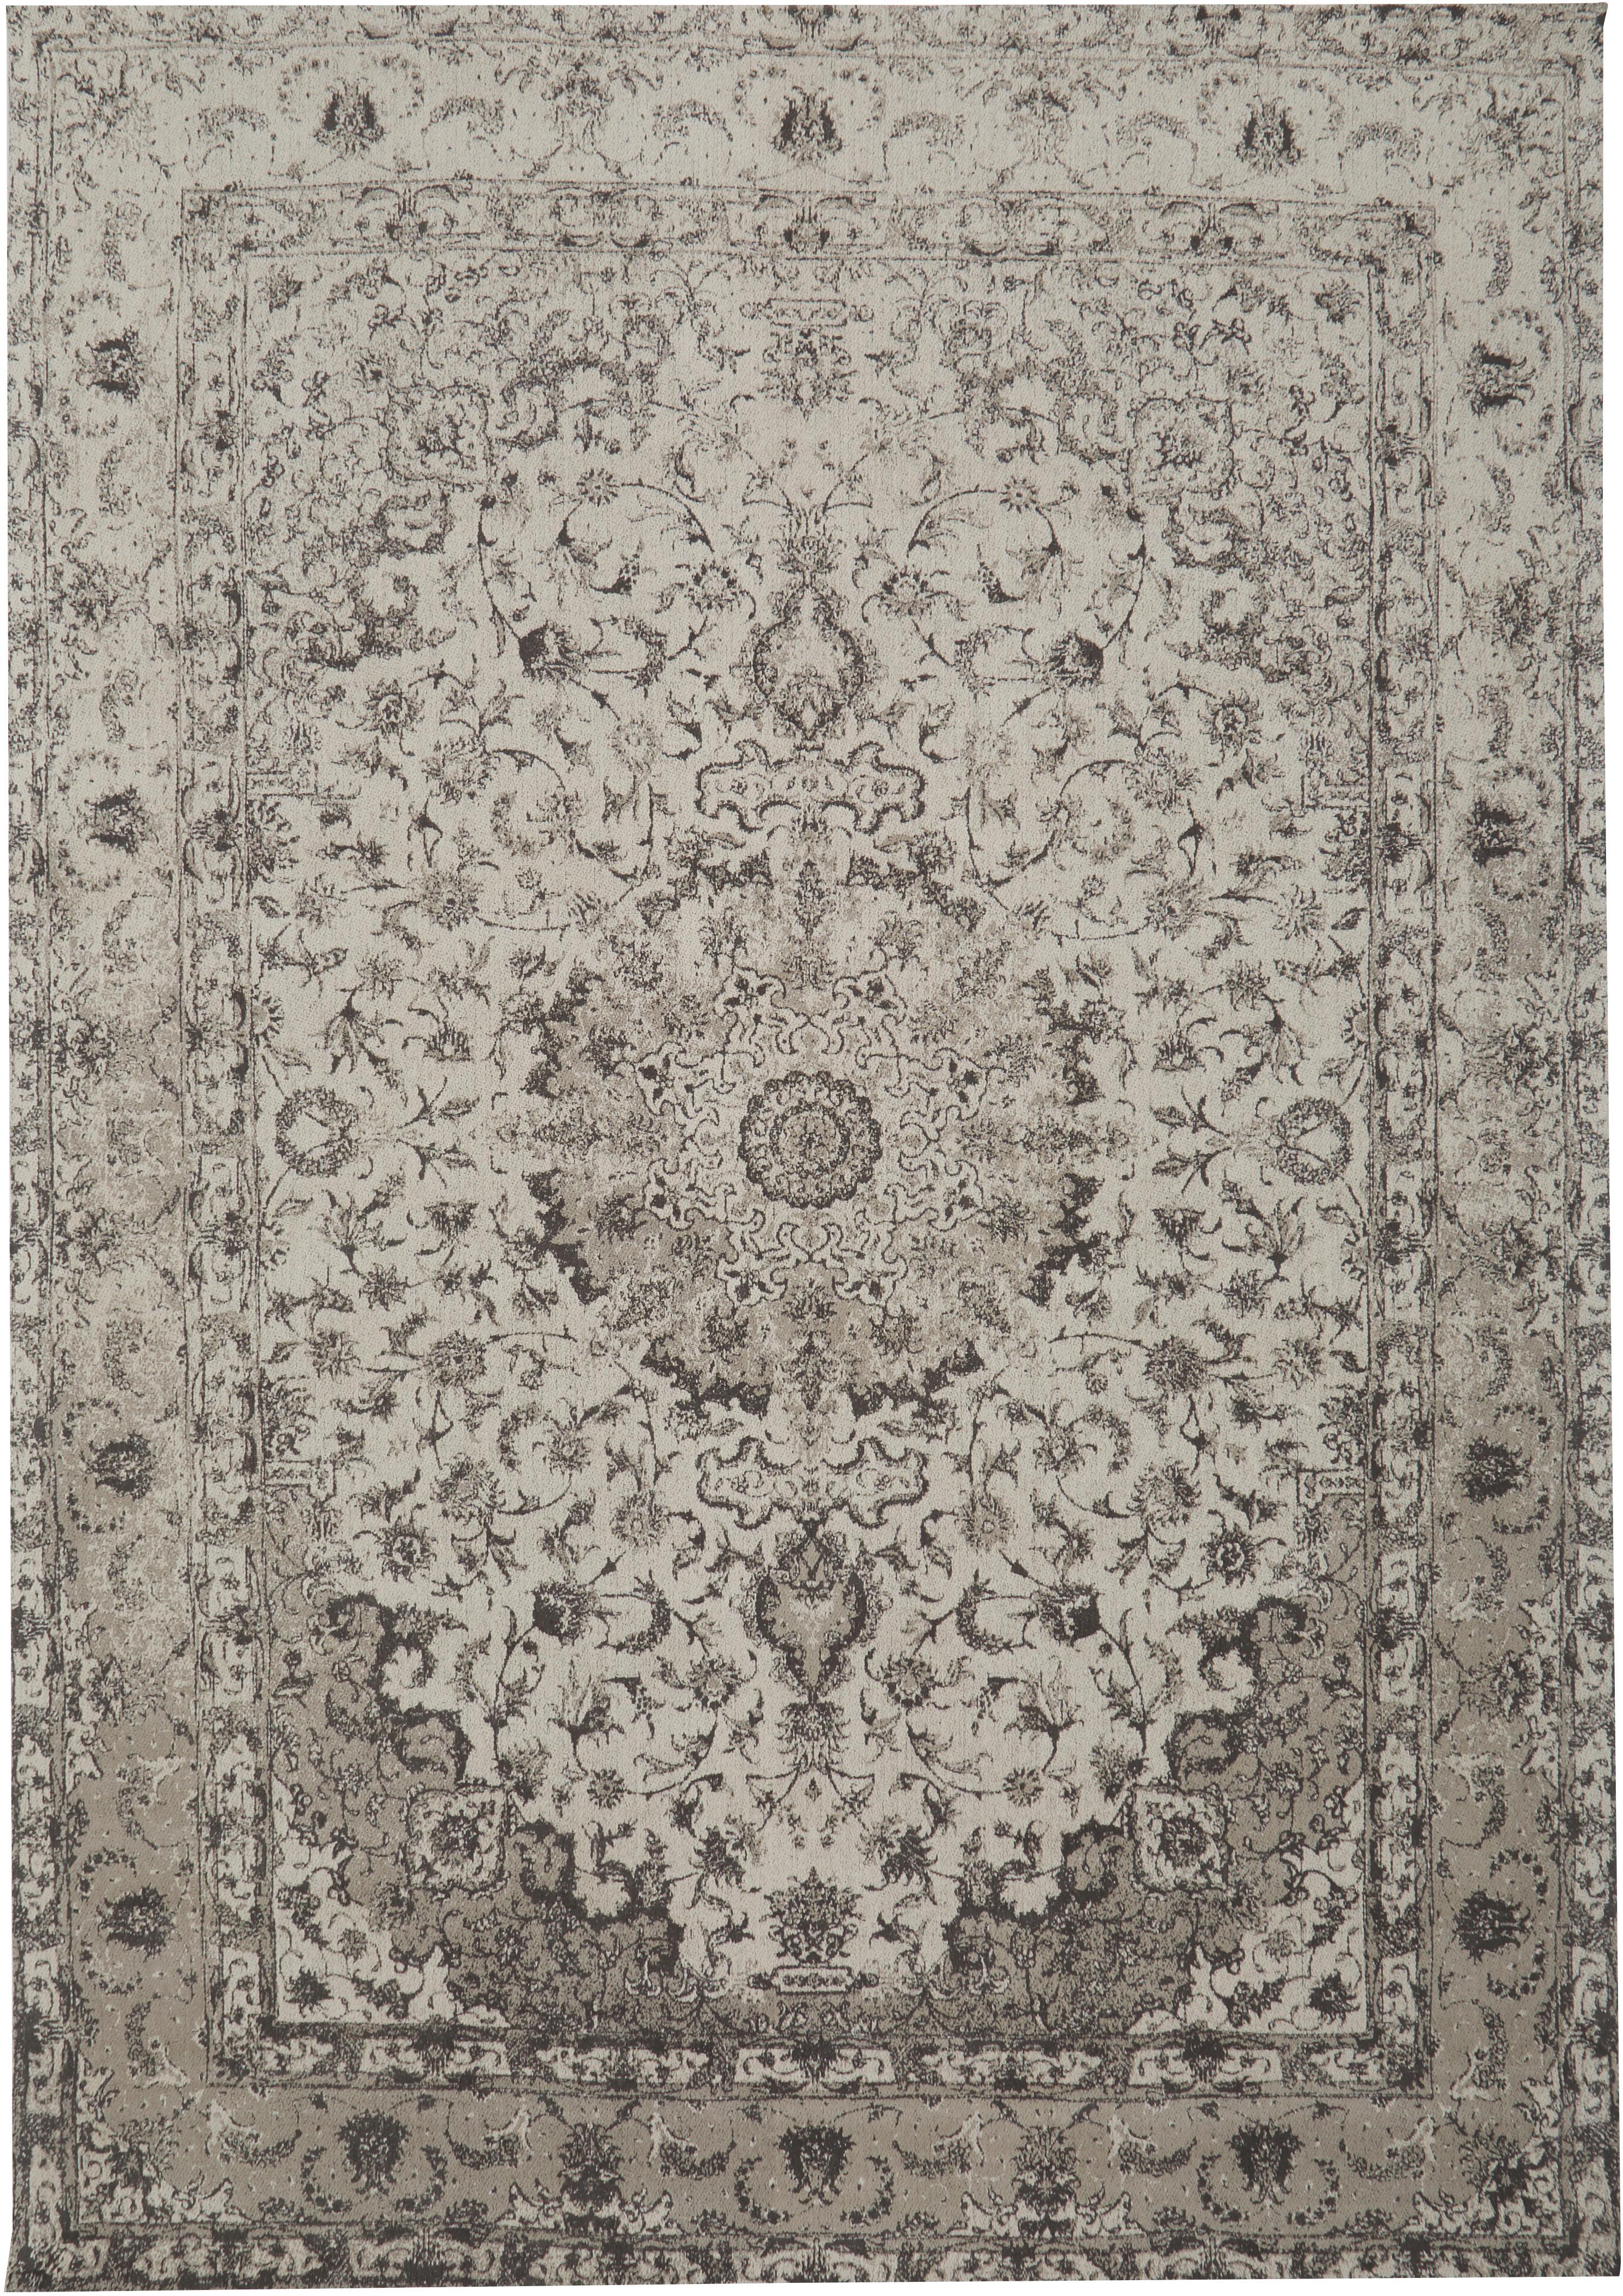 Alfombra artesanal de chenilla Sofia, estilo vintage, Parte superior: 95%algodón, 5%poliéster, Reverso: 100%algodón, Beige, gris, An 160 x L 230  cm(Tamaño M)